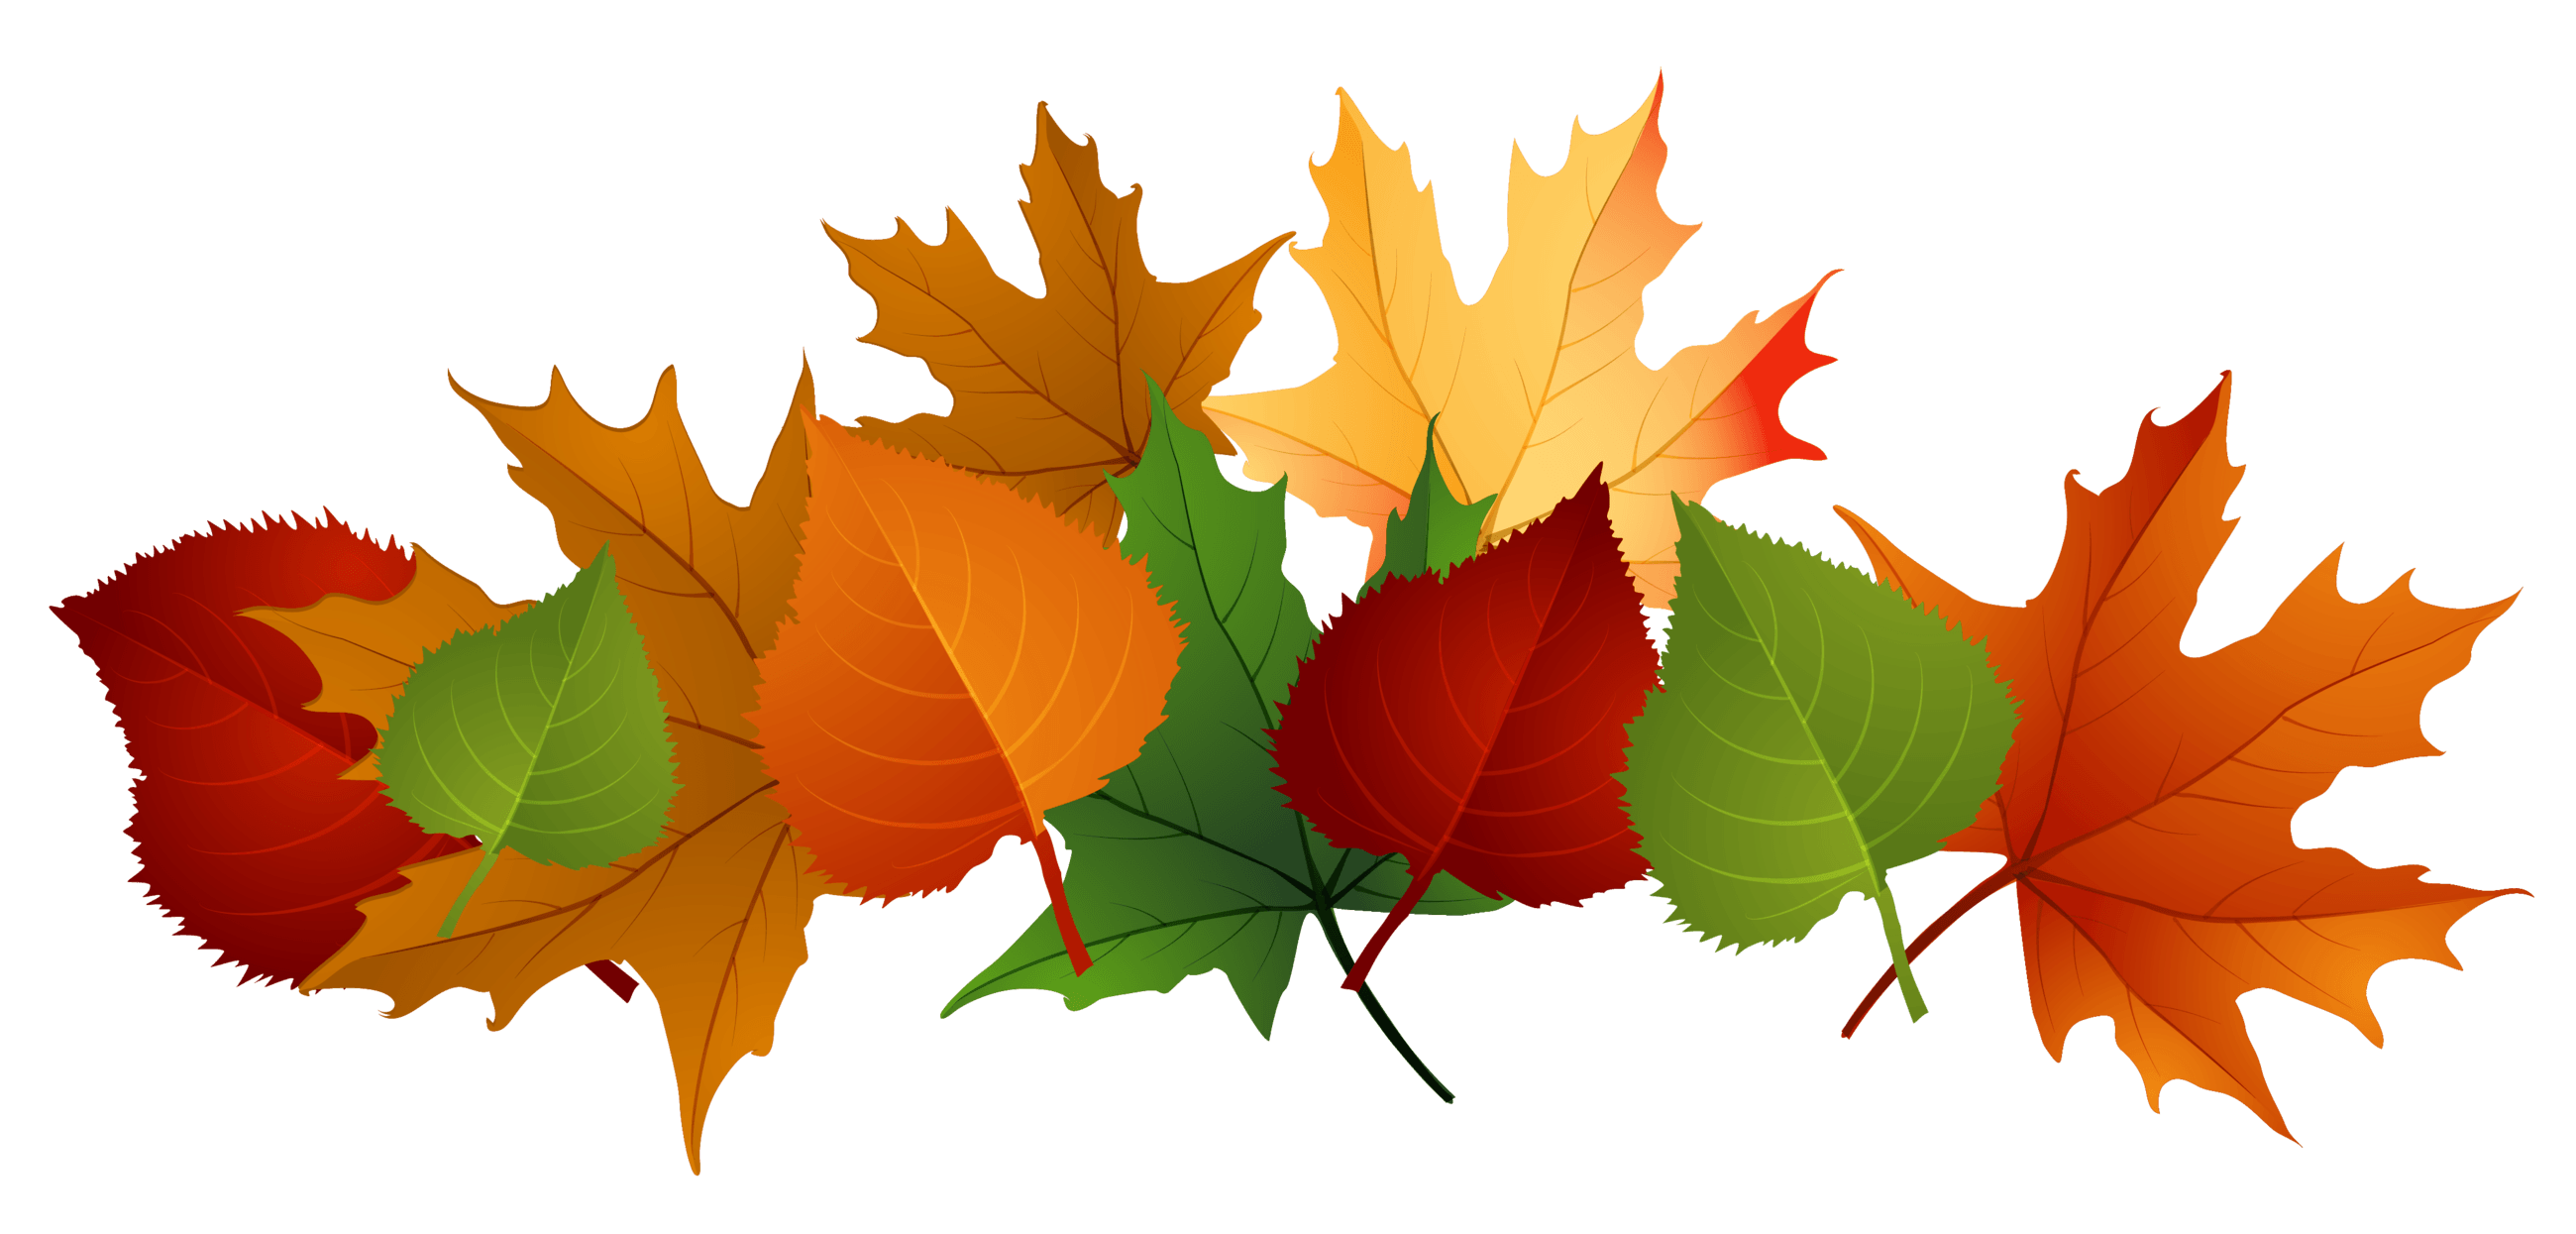 Leaf pile clipart clipart free download Leaf pile clipart 2 » Clipart Station clipart free download